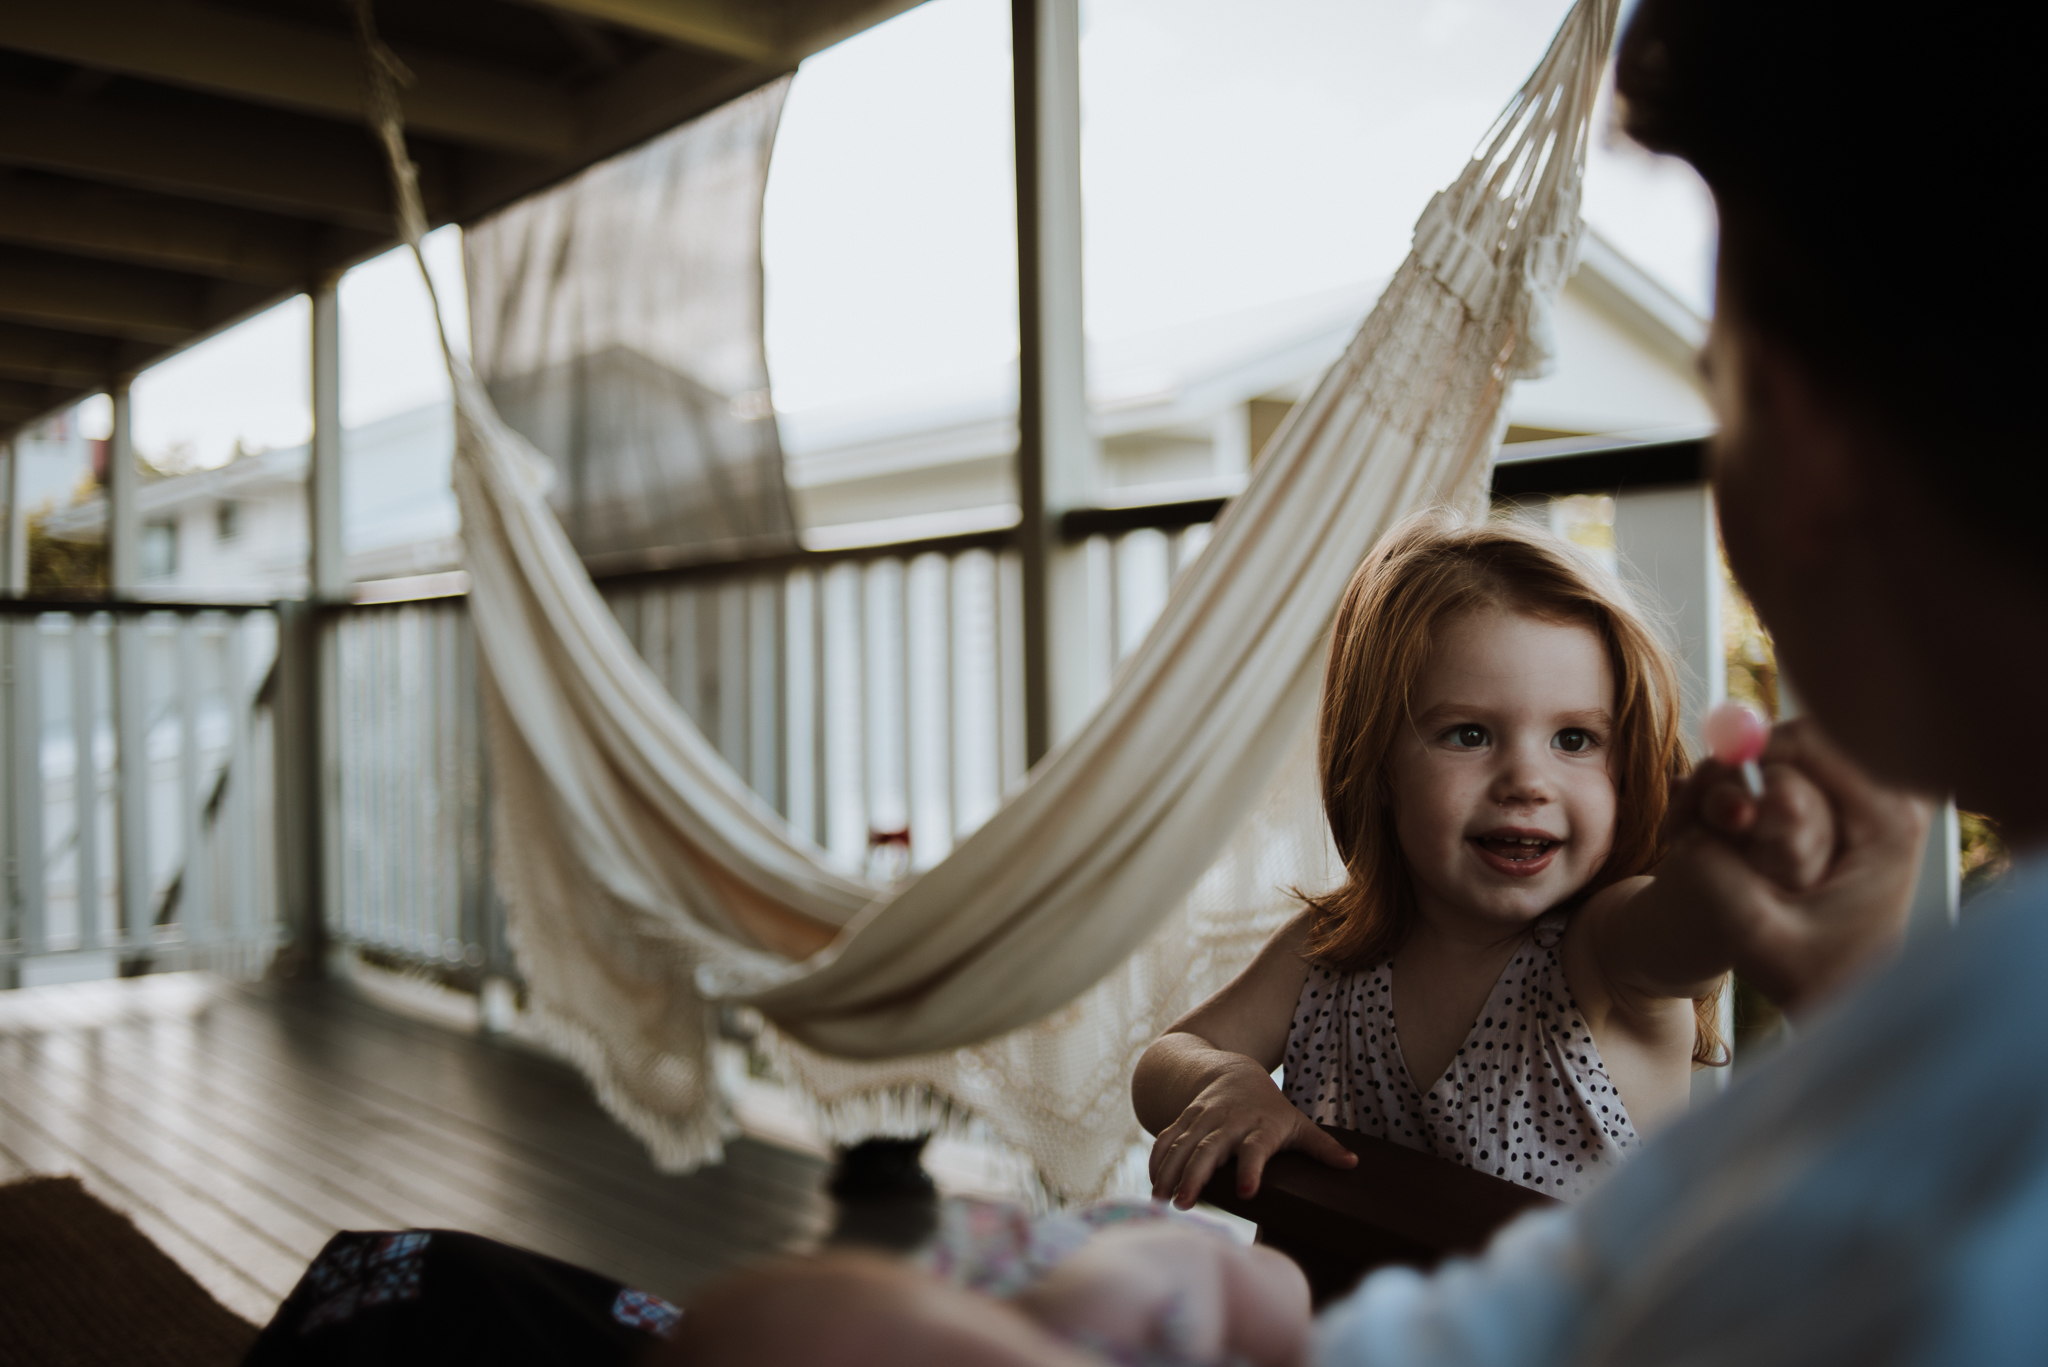 jessica-howard-sunshine-coast-photographer-web-60.jpg